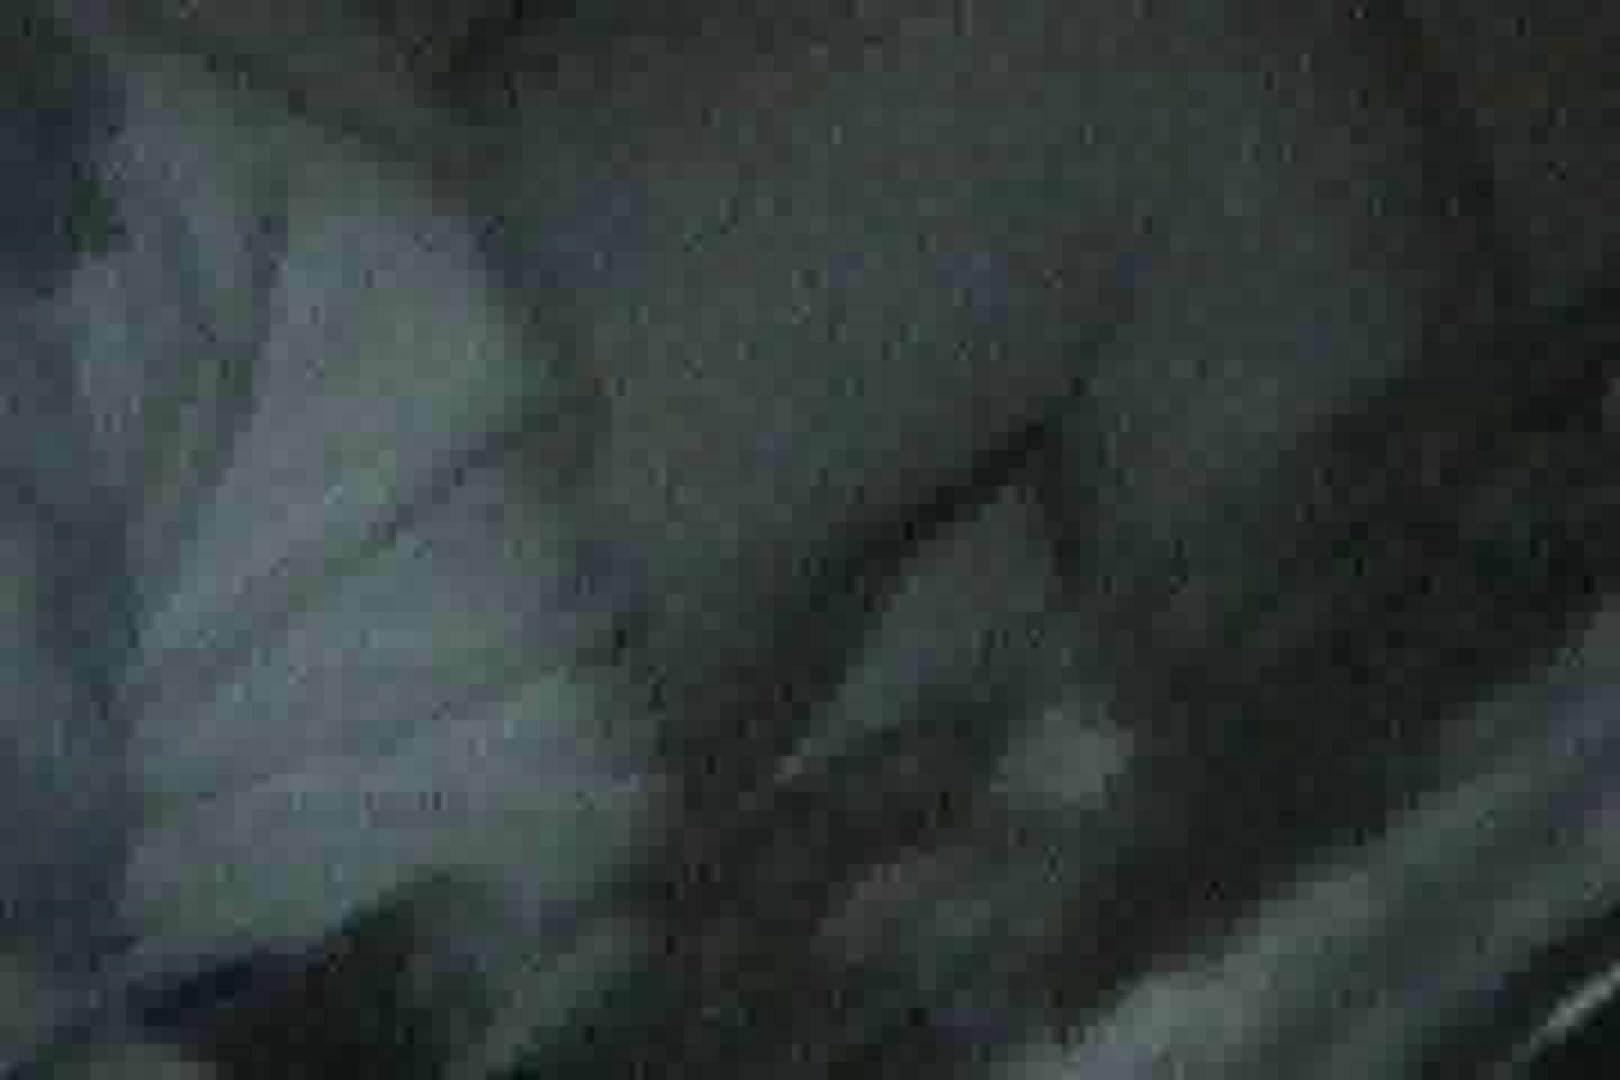 充血監督の深夜の運動会Vol.13 美女OL  105連発 96